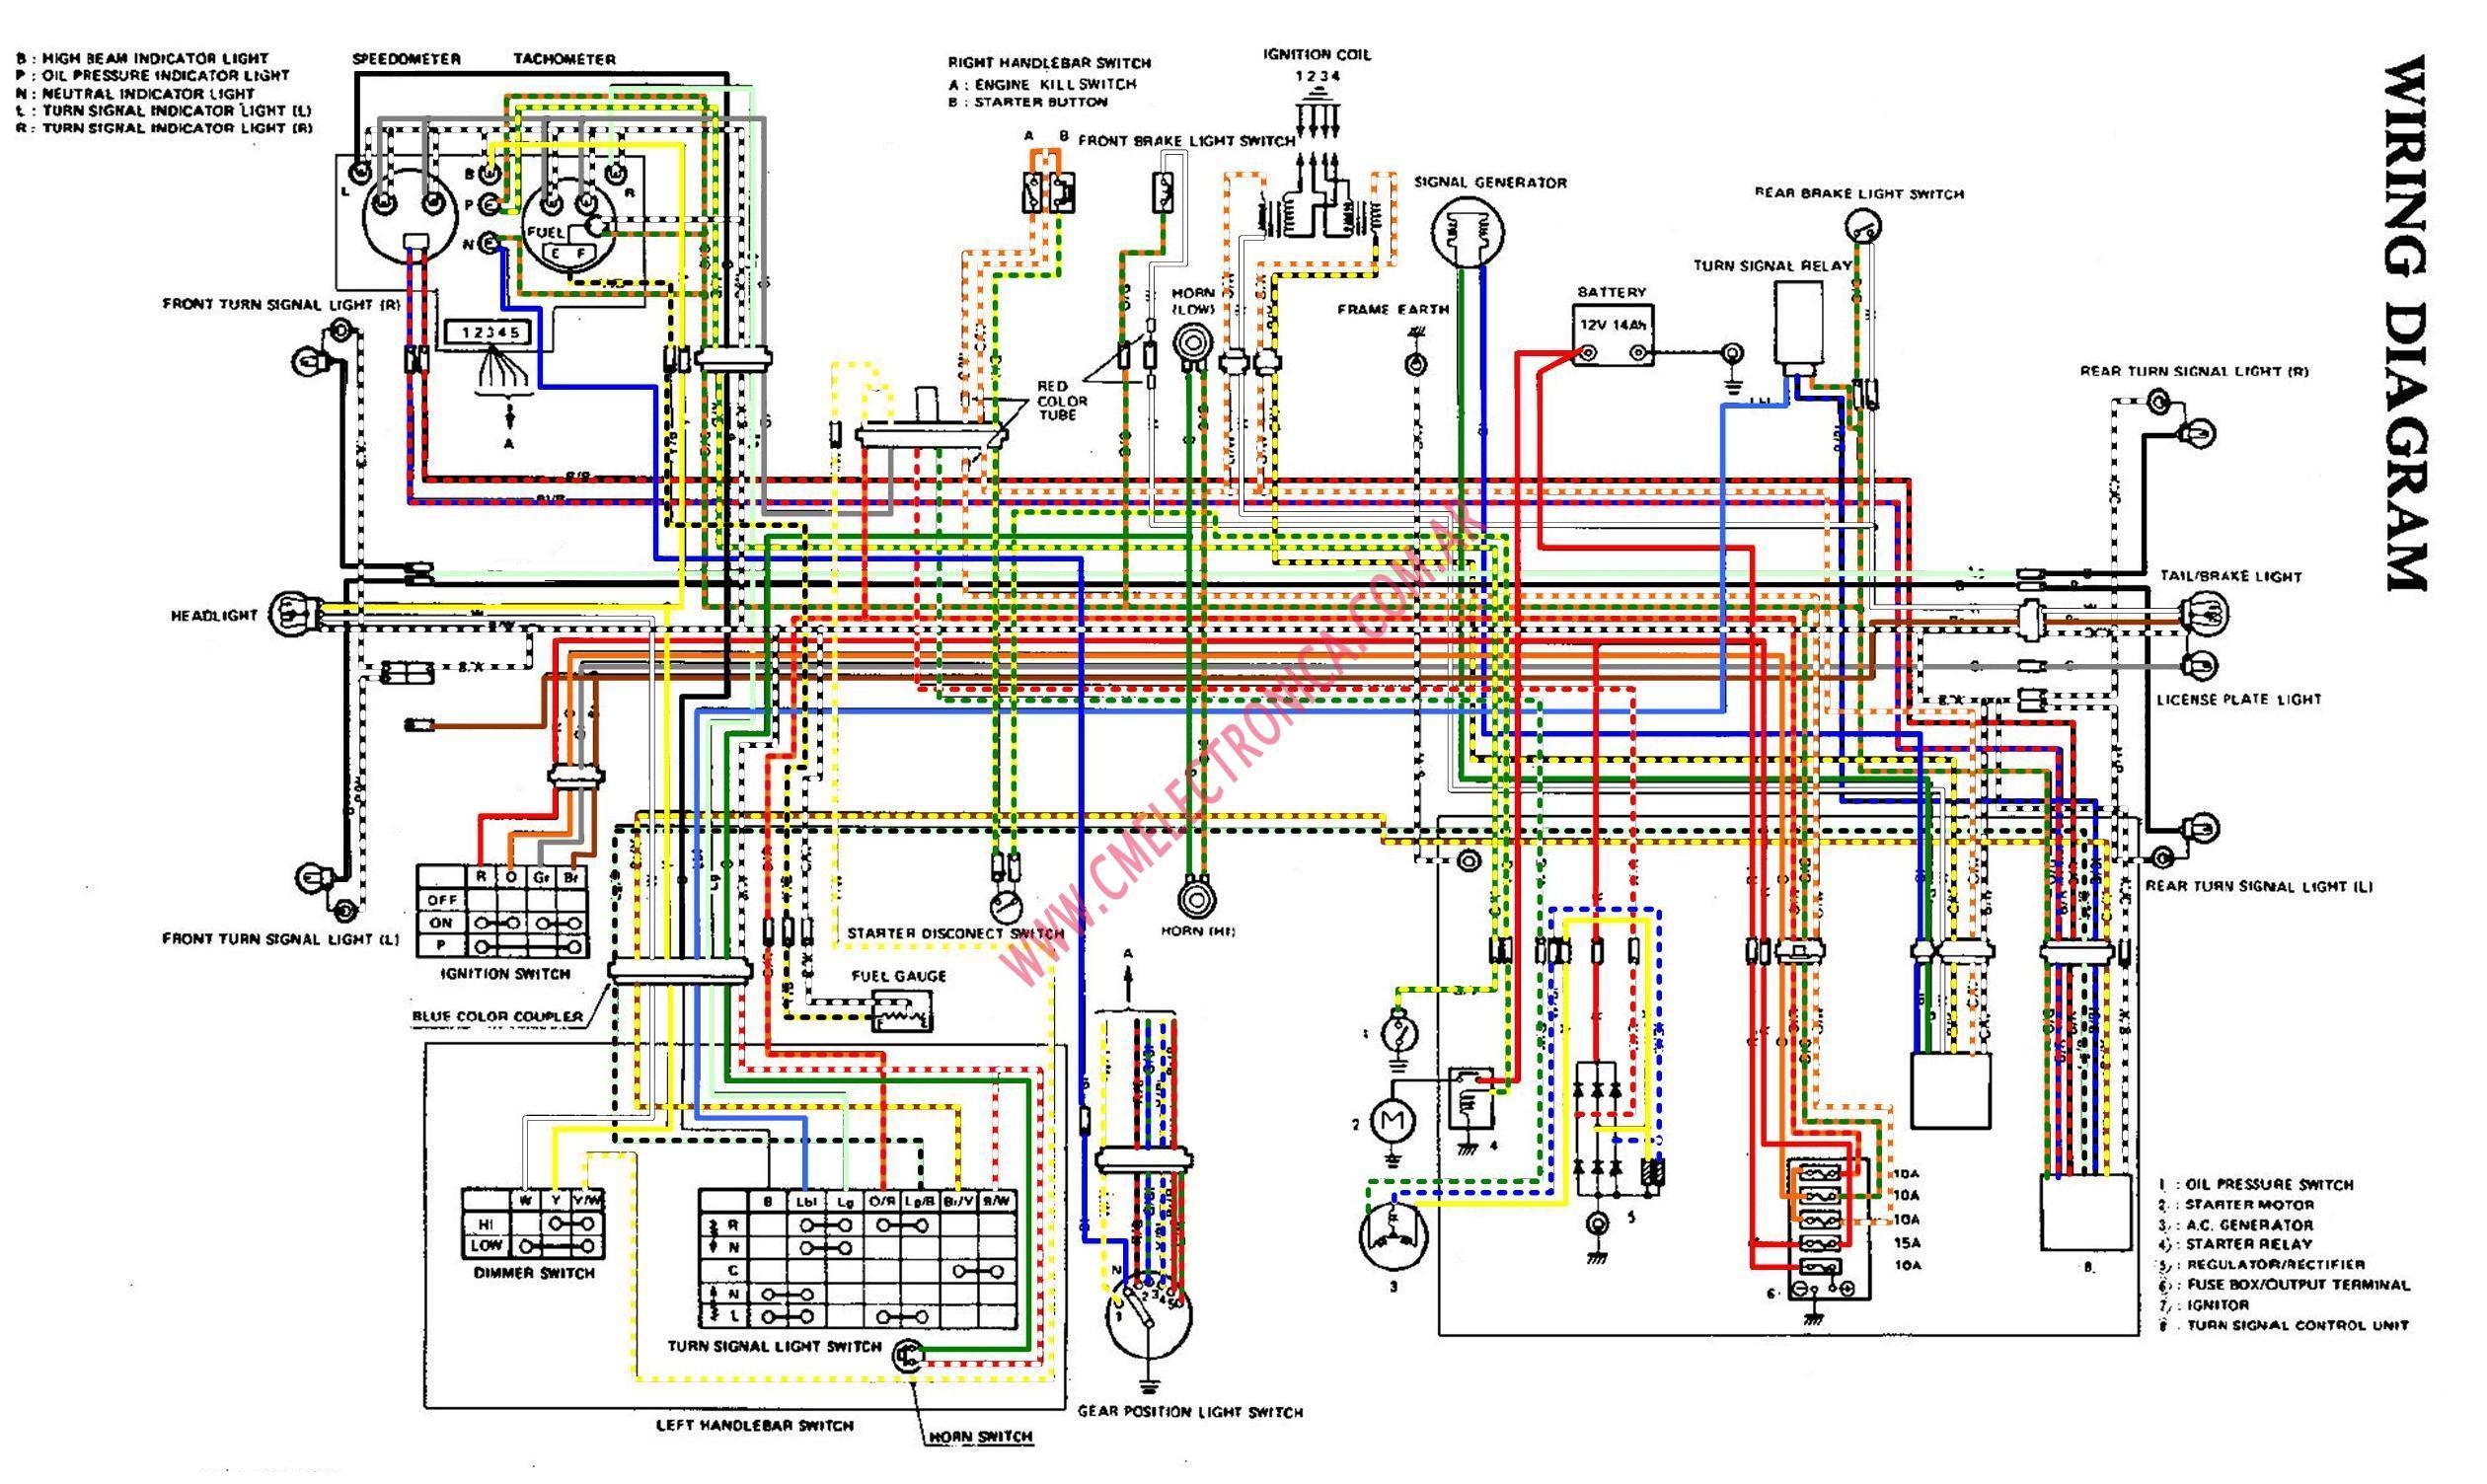 80 Suzuki Gs 850 Wiring Diagram - 2.11.msjsports.nl • on snatch block diagrams, transformer diagrams, led circuit diagrams, electrical diagrams, smart car diagrams, engine diagrams, honda motorcycle repair diagrams, pinout diagrams, gmc fuse box diagrams, motor diagrams, internet of things diagrams, friendship bracelet diagrams, electronic circuit diagrams, series and parallel circuits diagrams, hvac diagrams, battery diagrams, sincgars radio configurations diagrams, troubleshooting diagrams, switch diagrams, lighting diagrams,